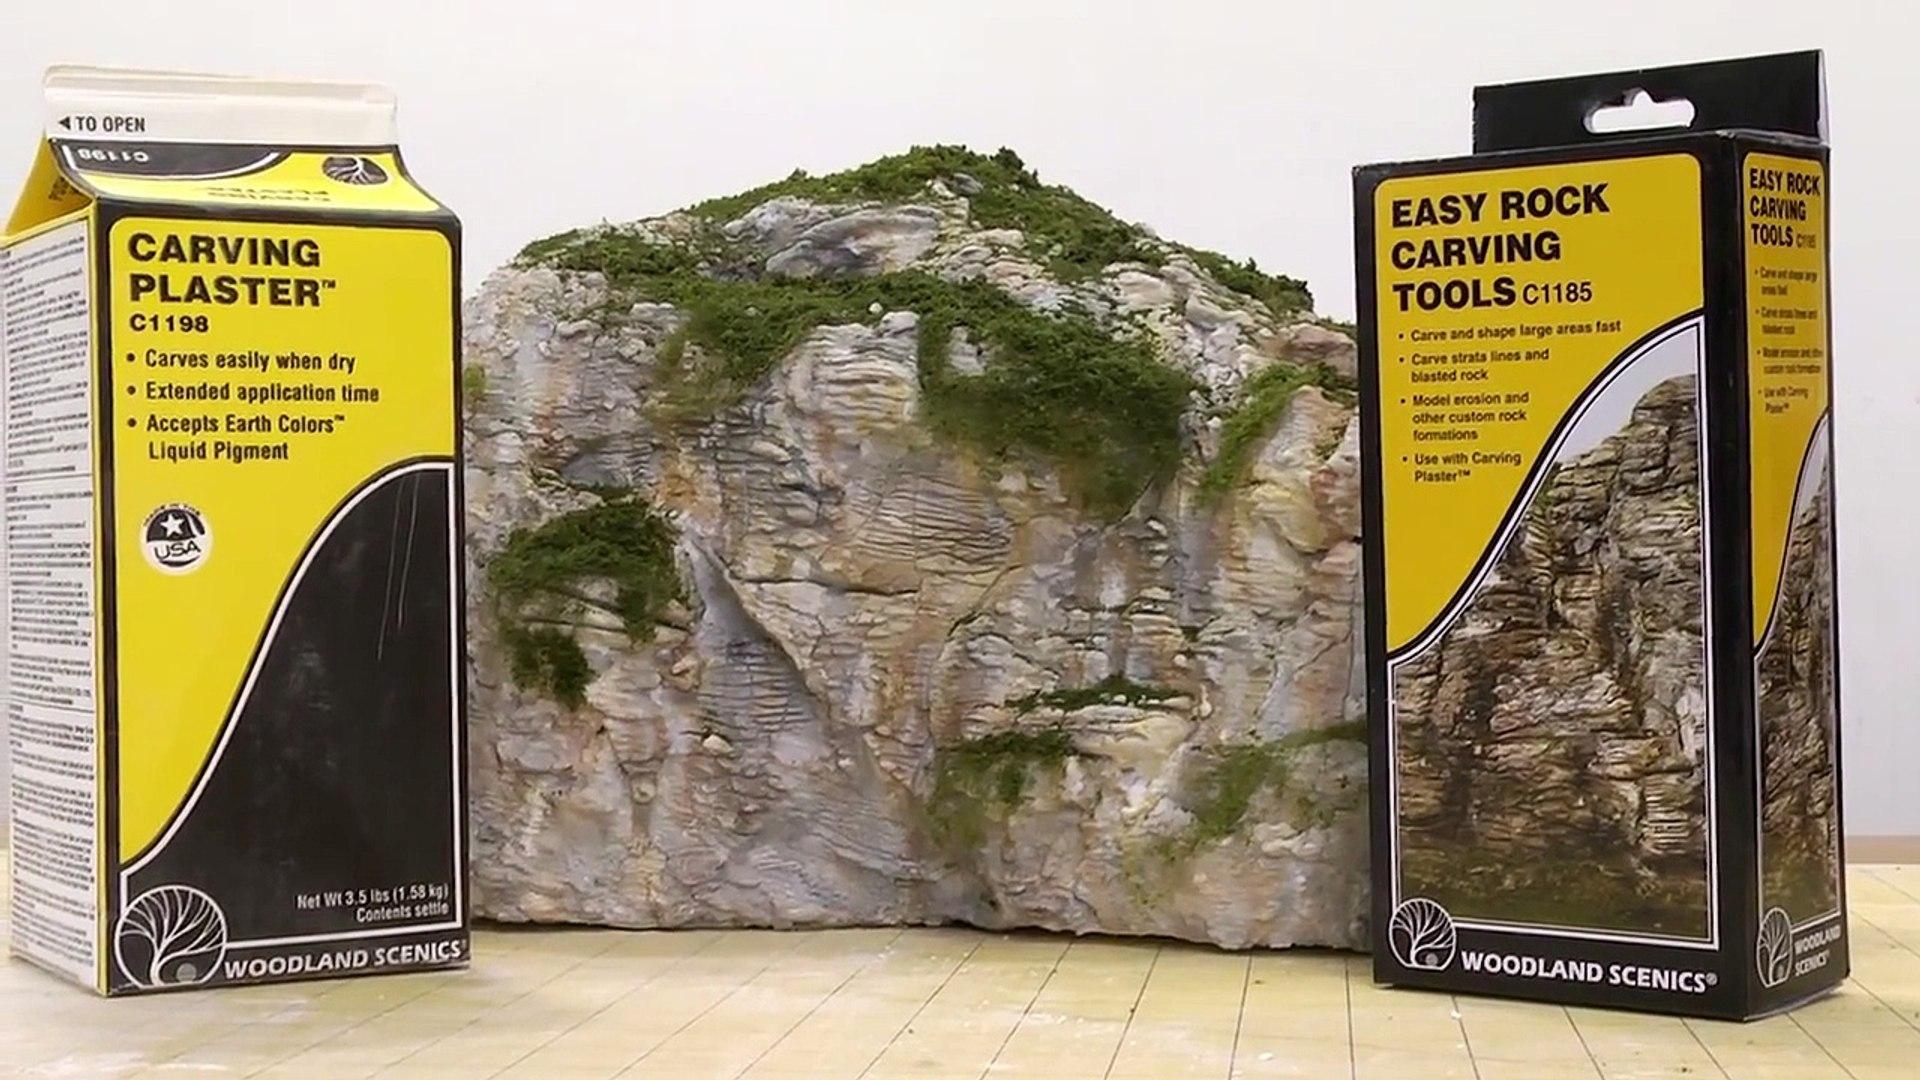 Woodland Scenics C1185 Easy Rock Carving Tools